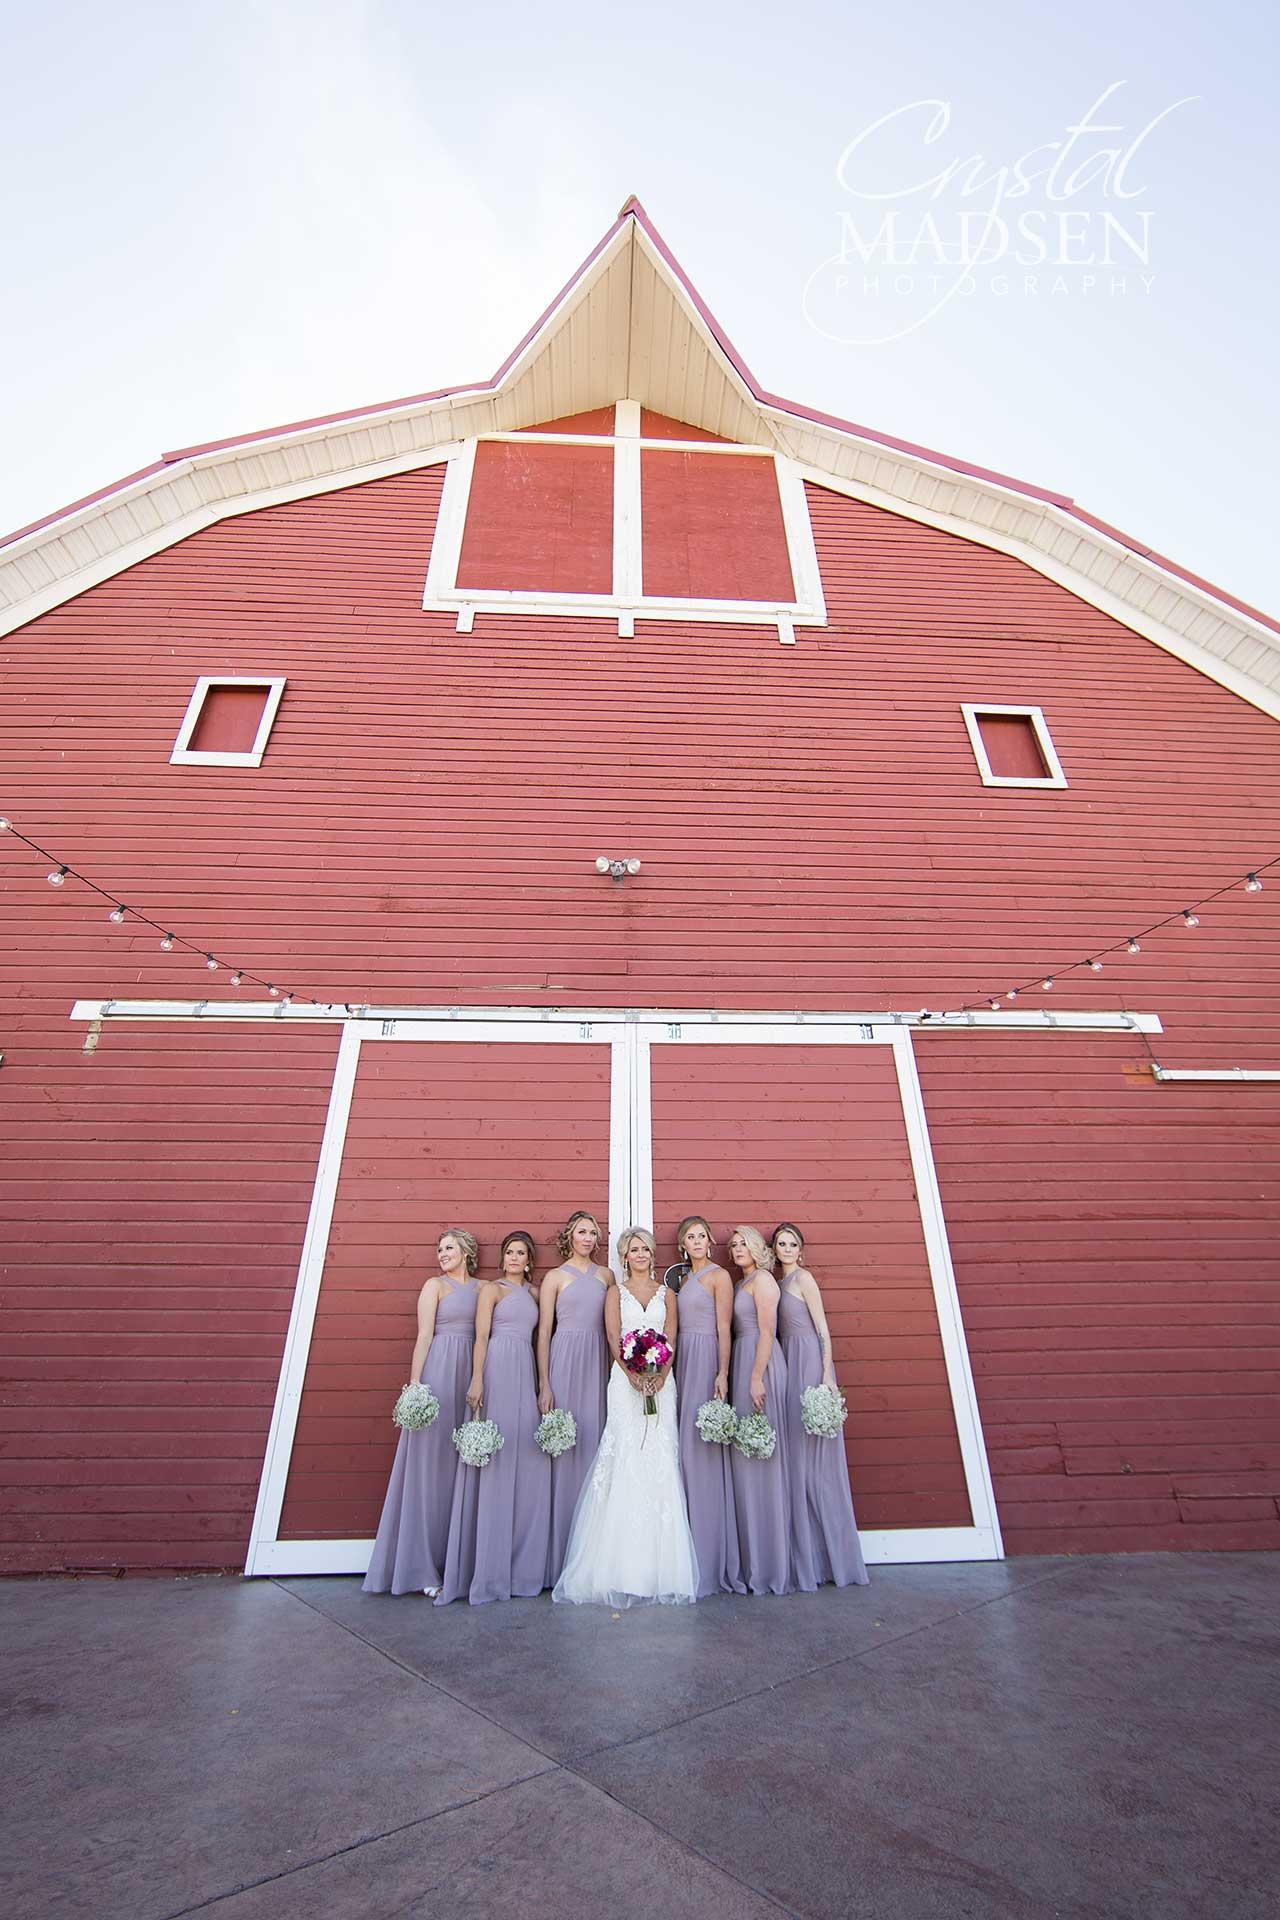 Upscale country wedding